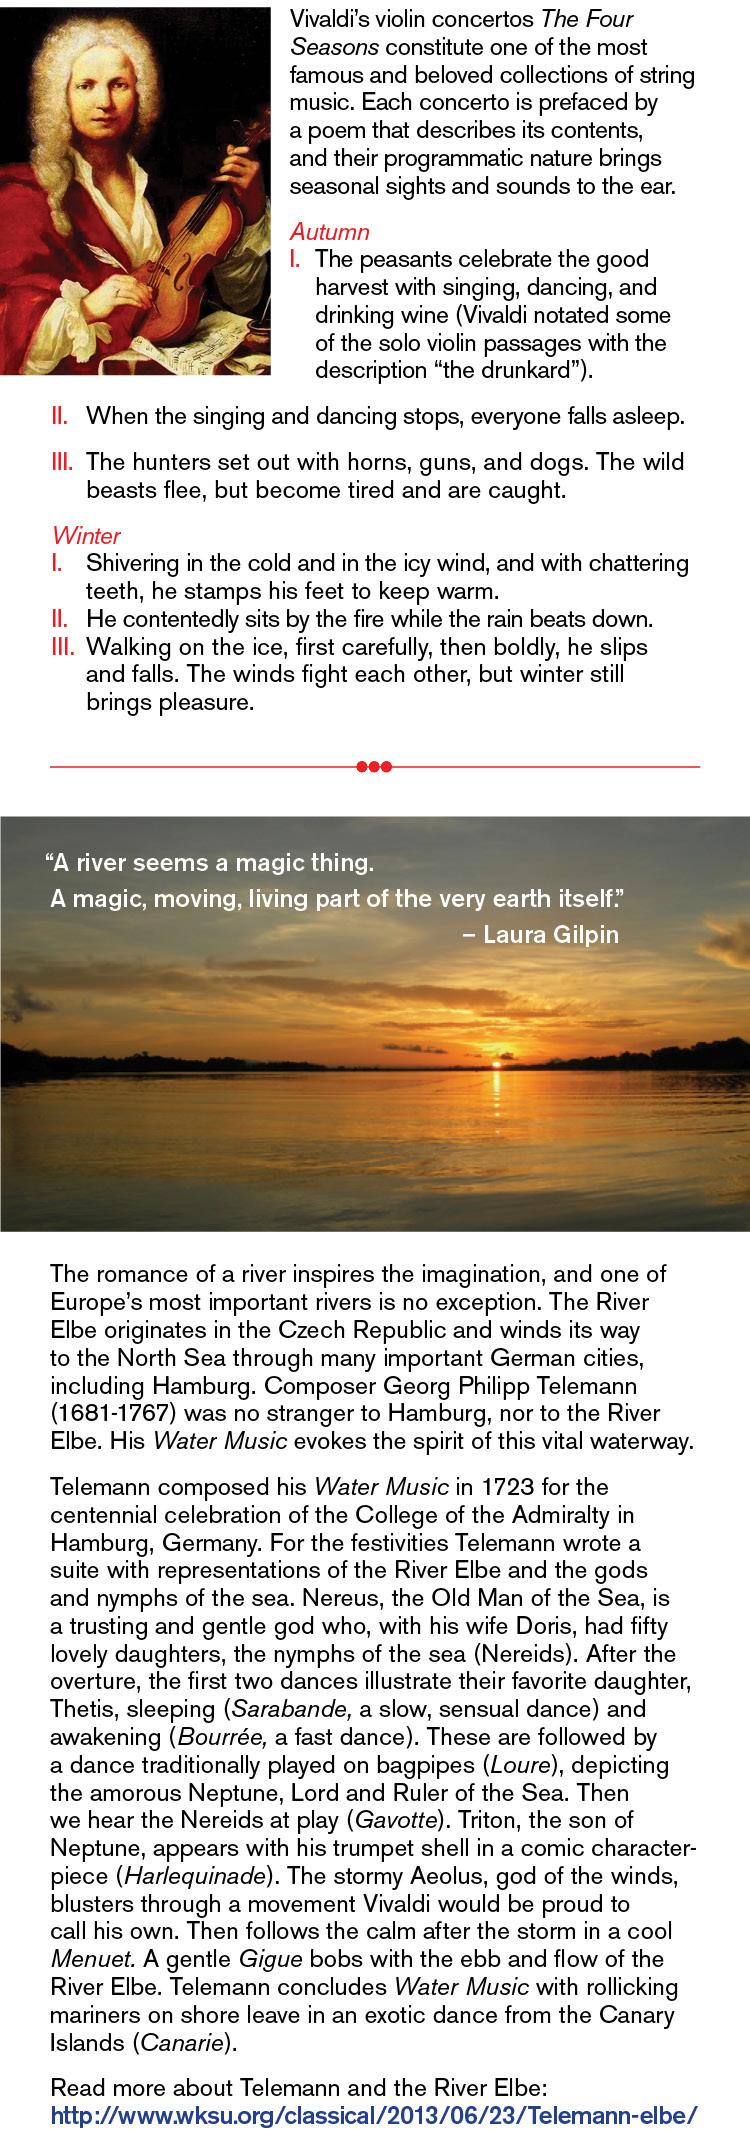 Autumn, Winter, Fire & Water – Santa Fe Pro Musica